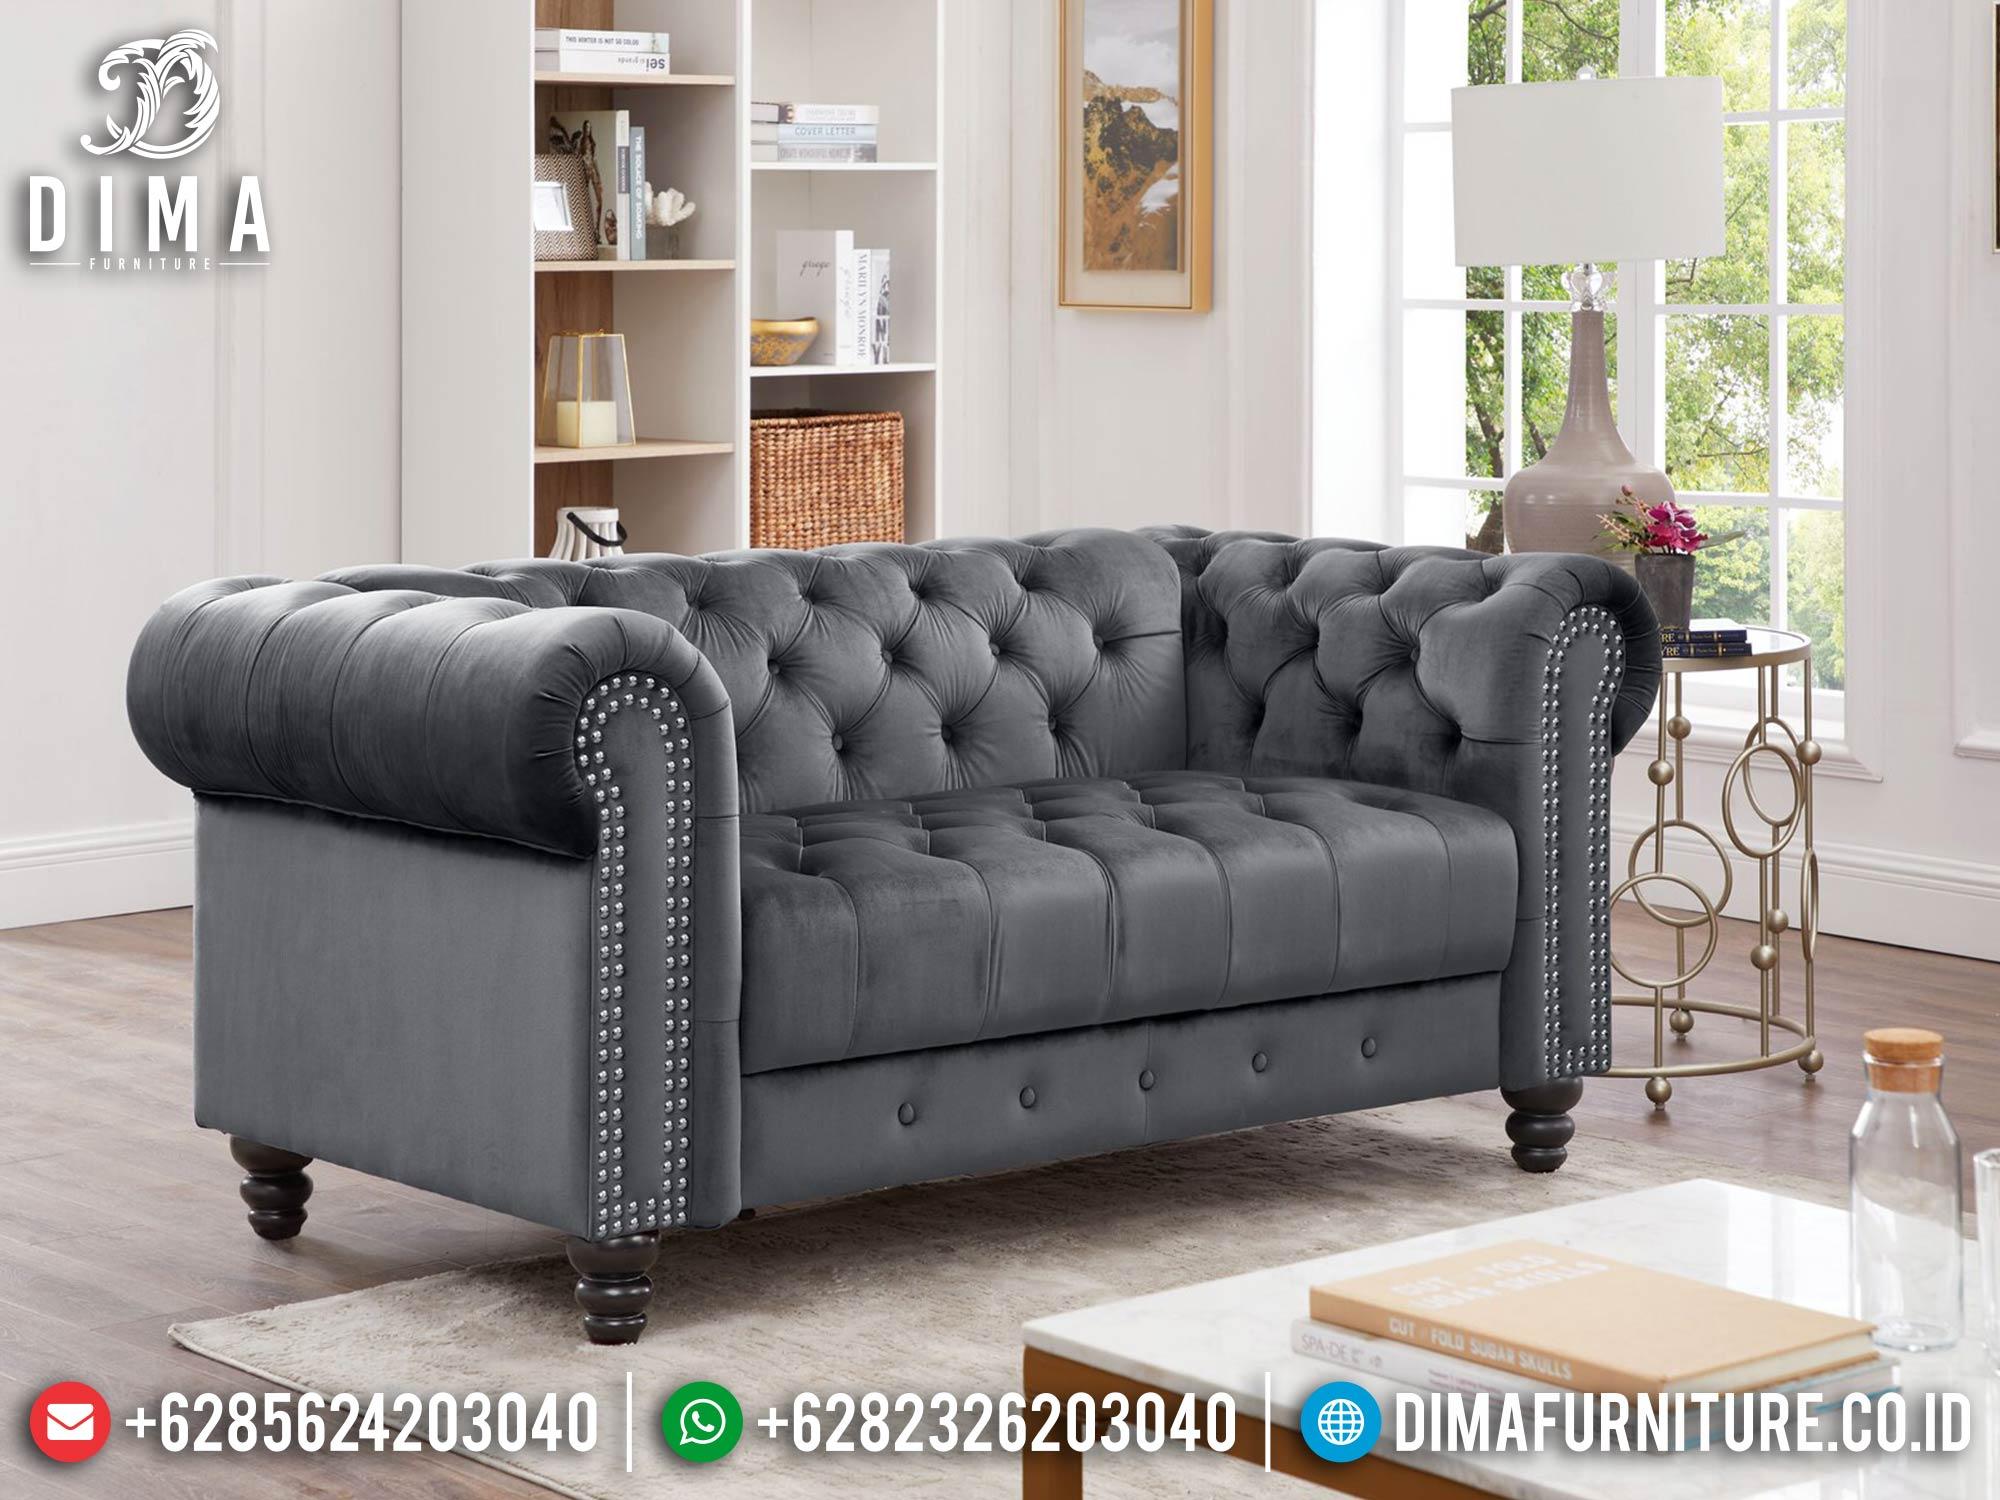 Sofa Tamu Minimalis 2 Seater Luxury Beludru Fabric Grey Color Softly MM-1092